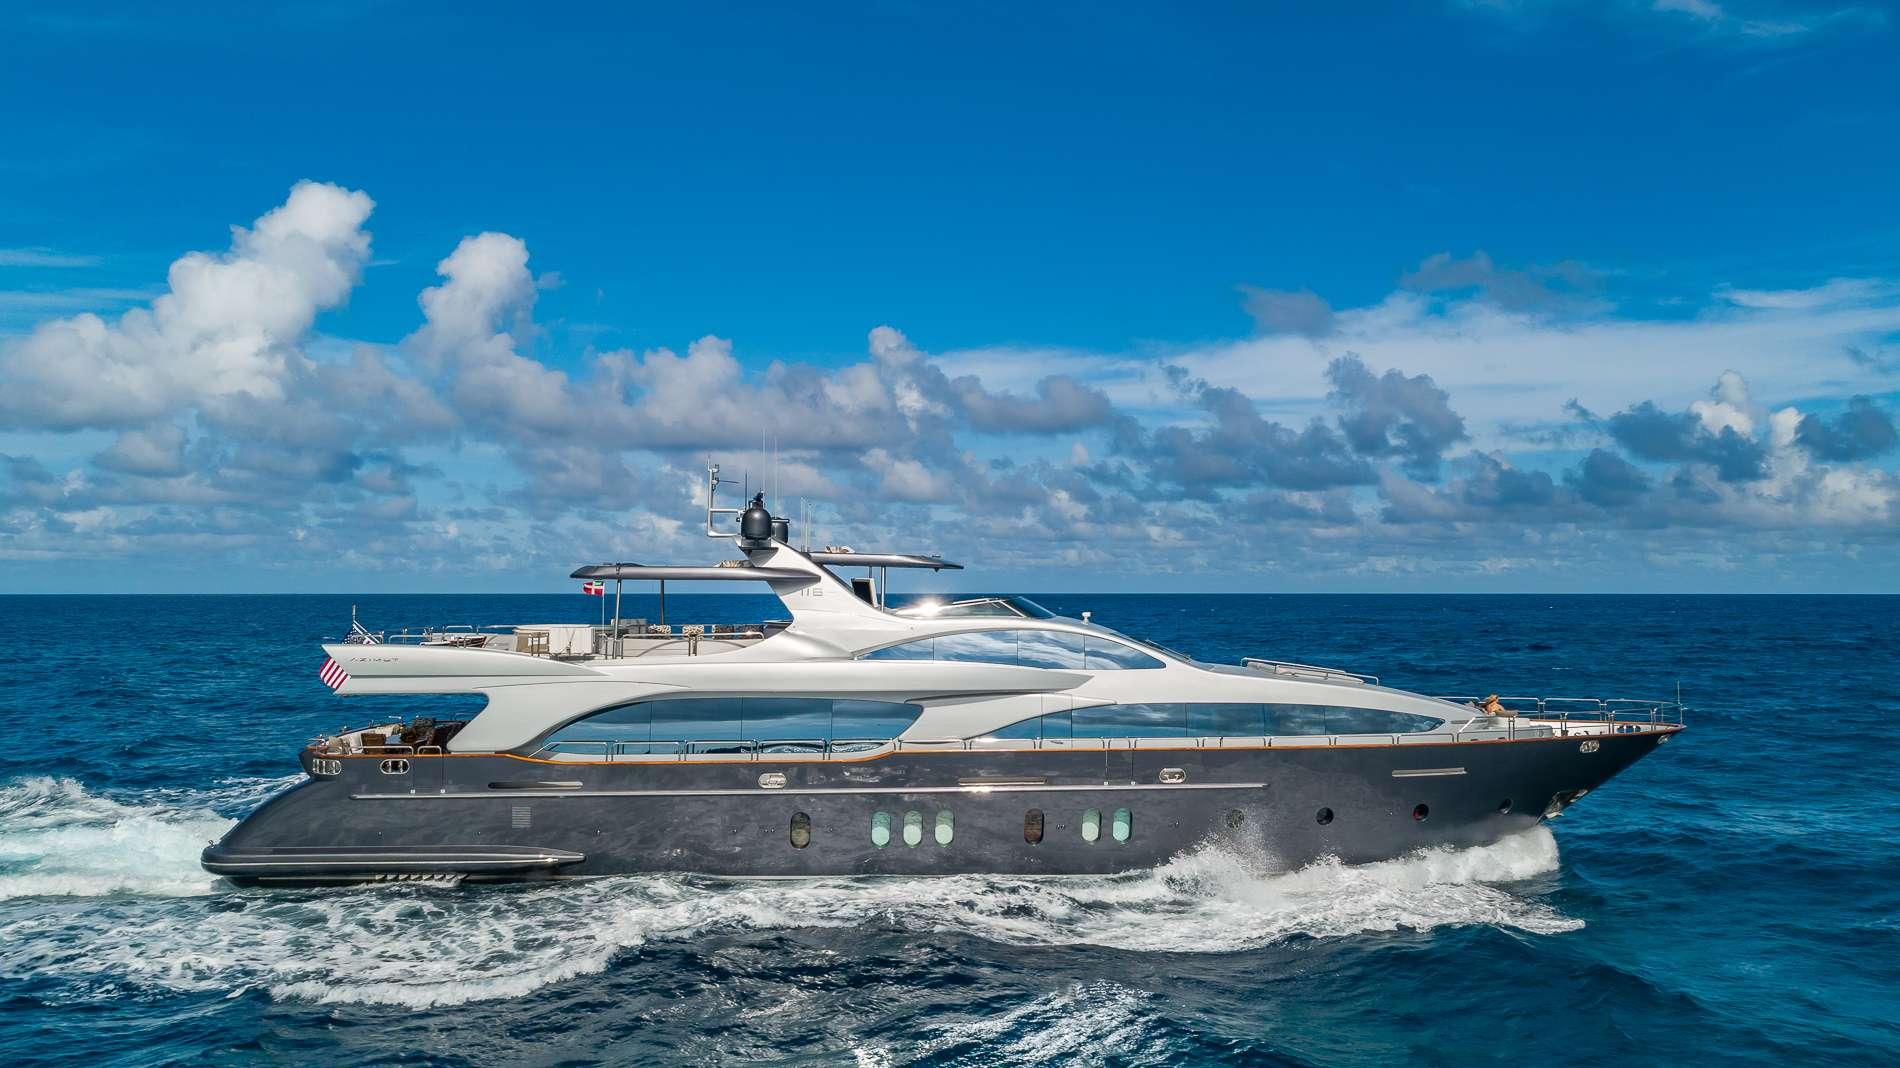 Power Yacht 'Power', 12 PAX, 6 Crew, 116.00 Ft, 35.00 Meters, Built 2011, Azimut, Refit Year 2016